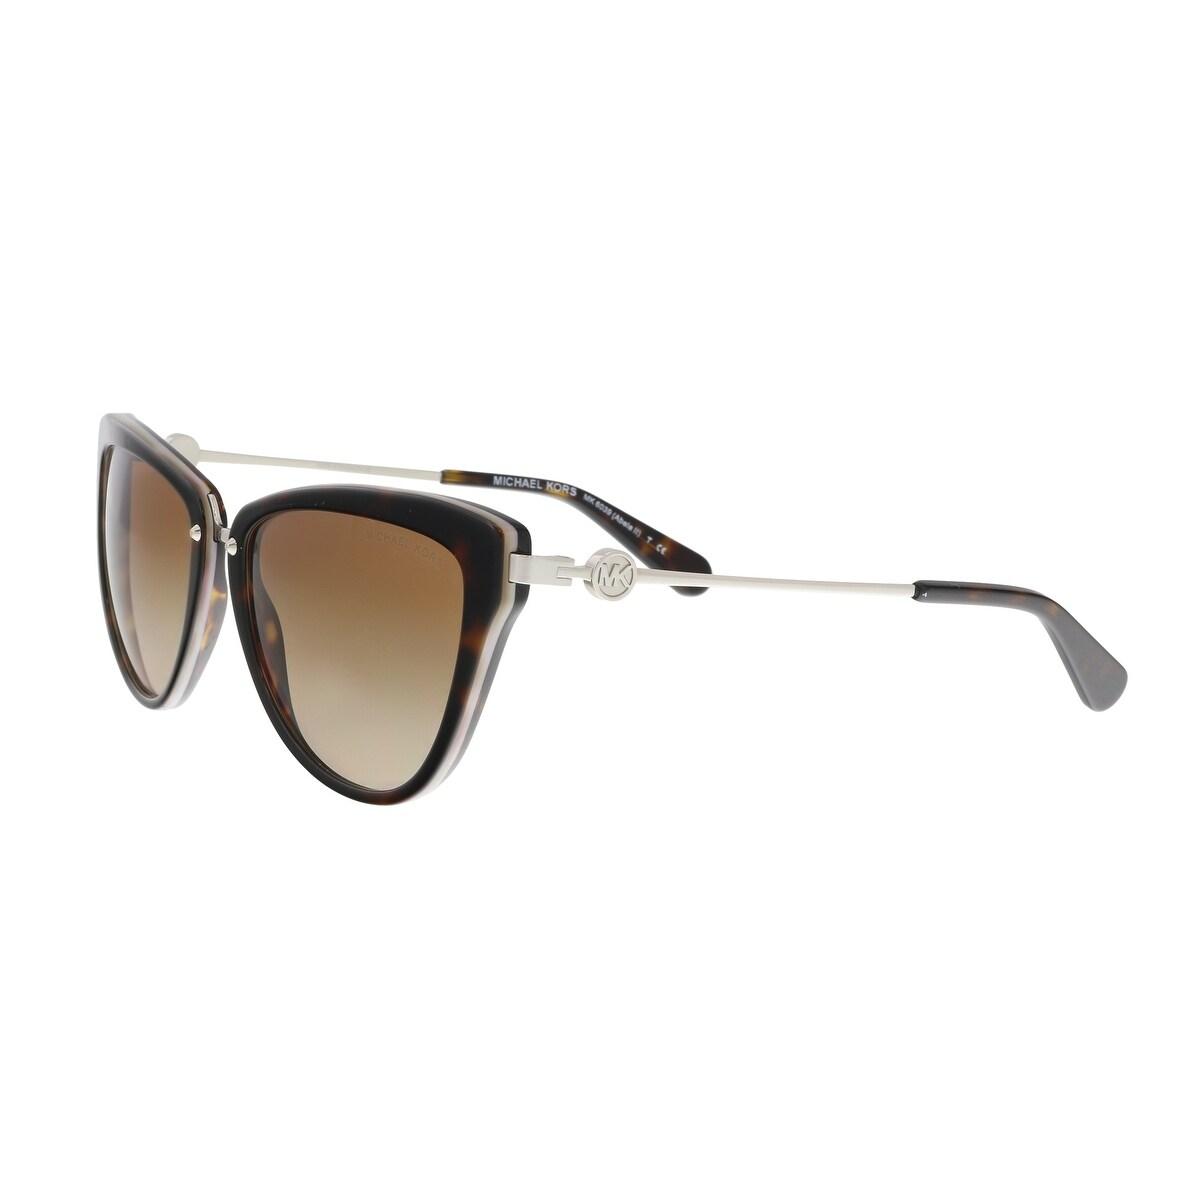 61adc66aca1 Shop Michael Kors MK6039 314513 2N ABELA II DARK TORTOISE LAVENDAR CATEYE  Sunglasses - 56-17-140 - Free Shipping Today - Overstock - 19430906